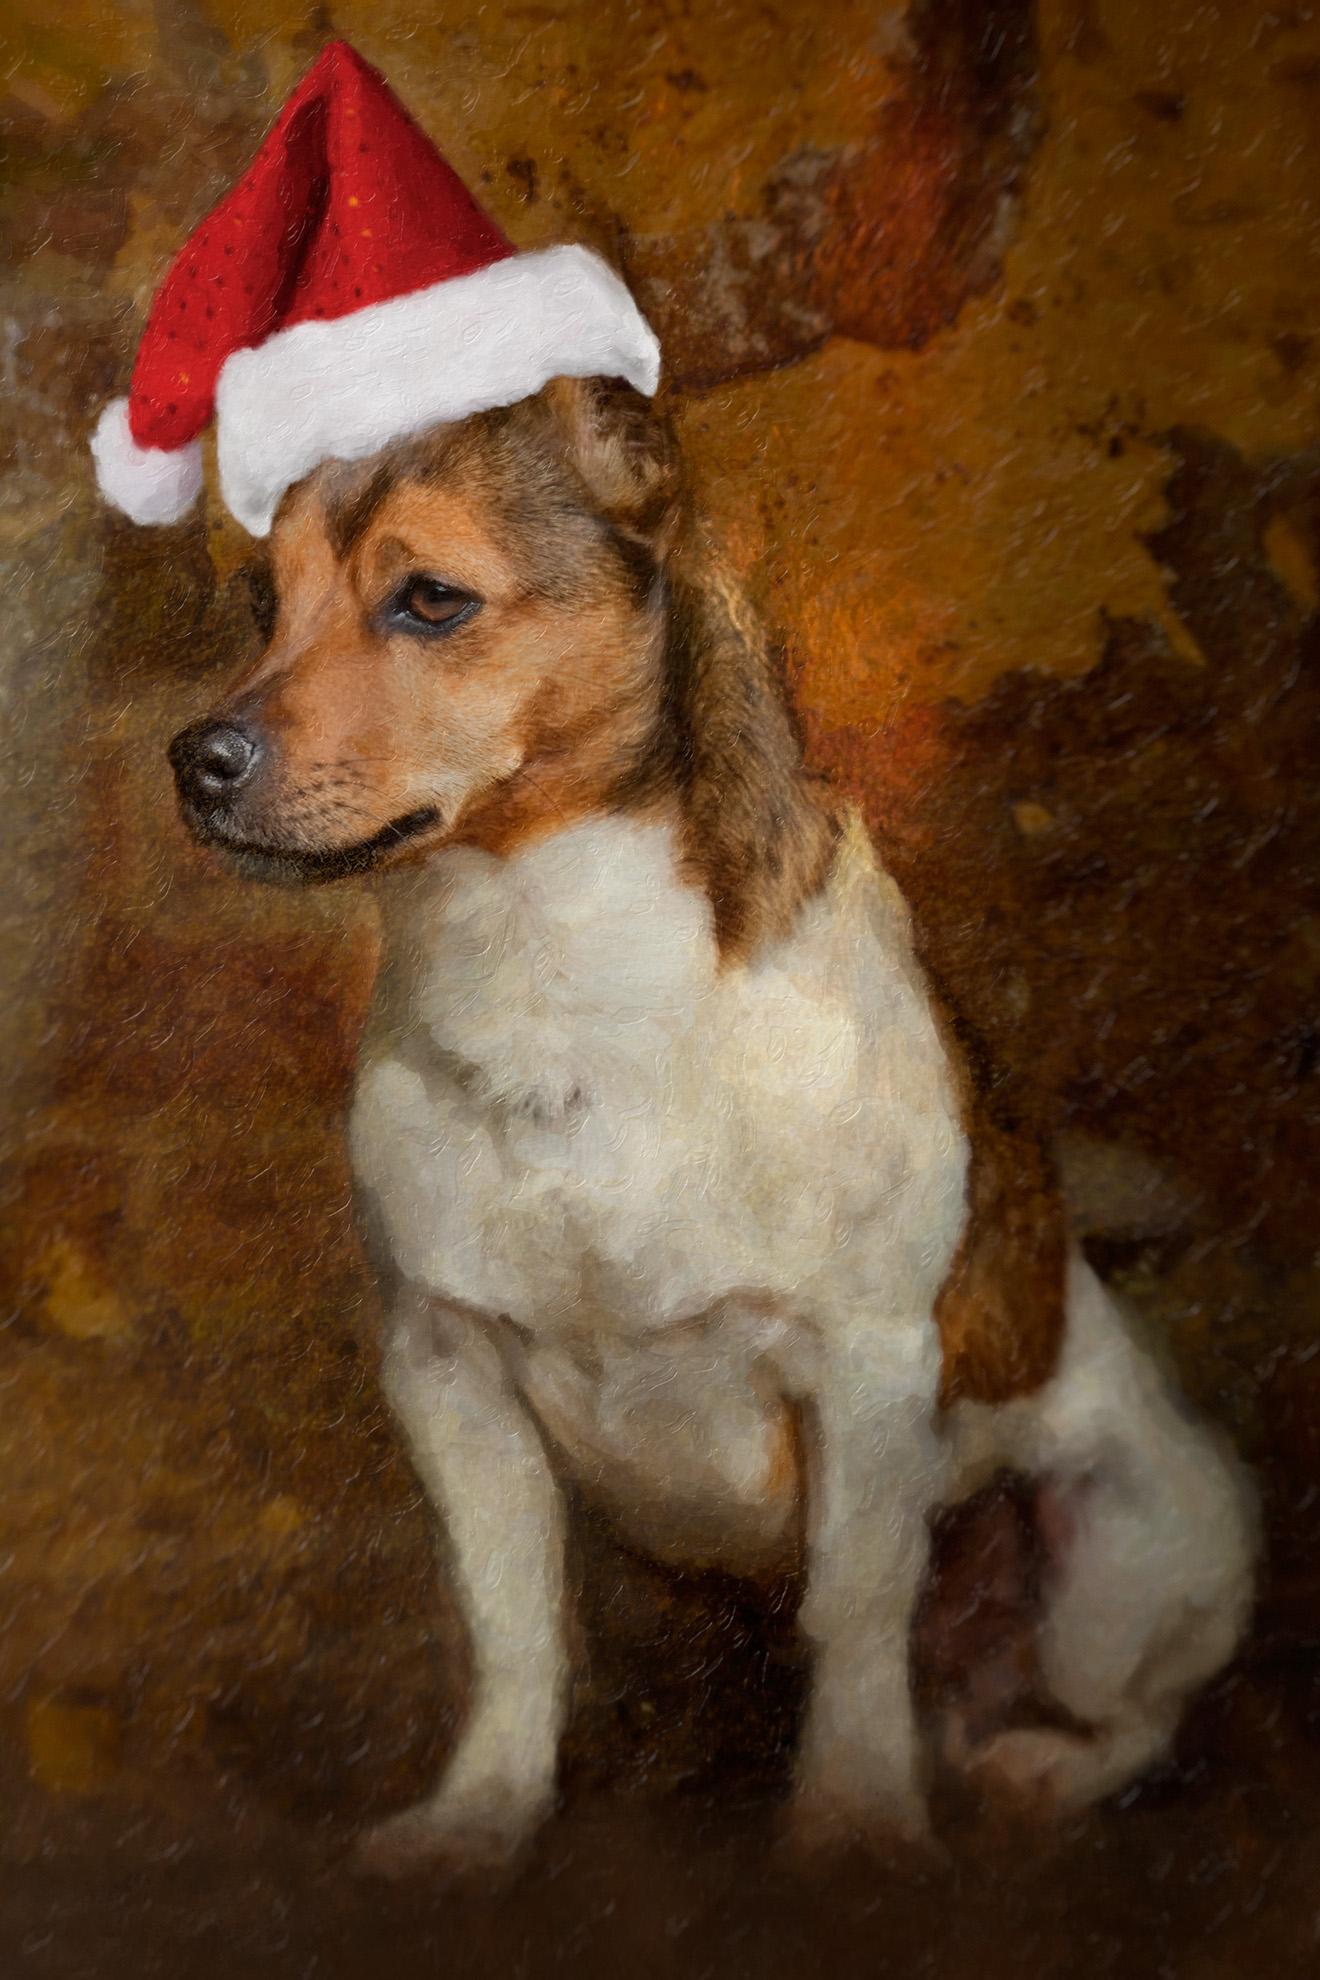 GOSH I HOPE CHRISTMAS COMES SOON!